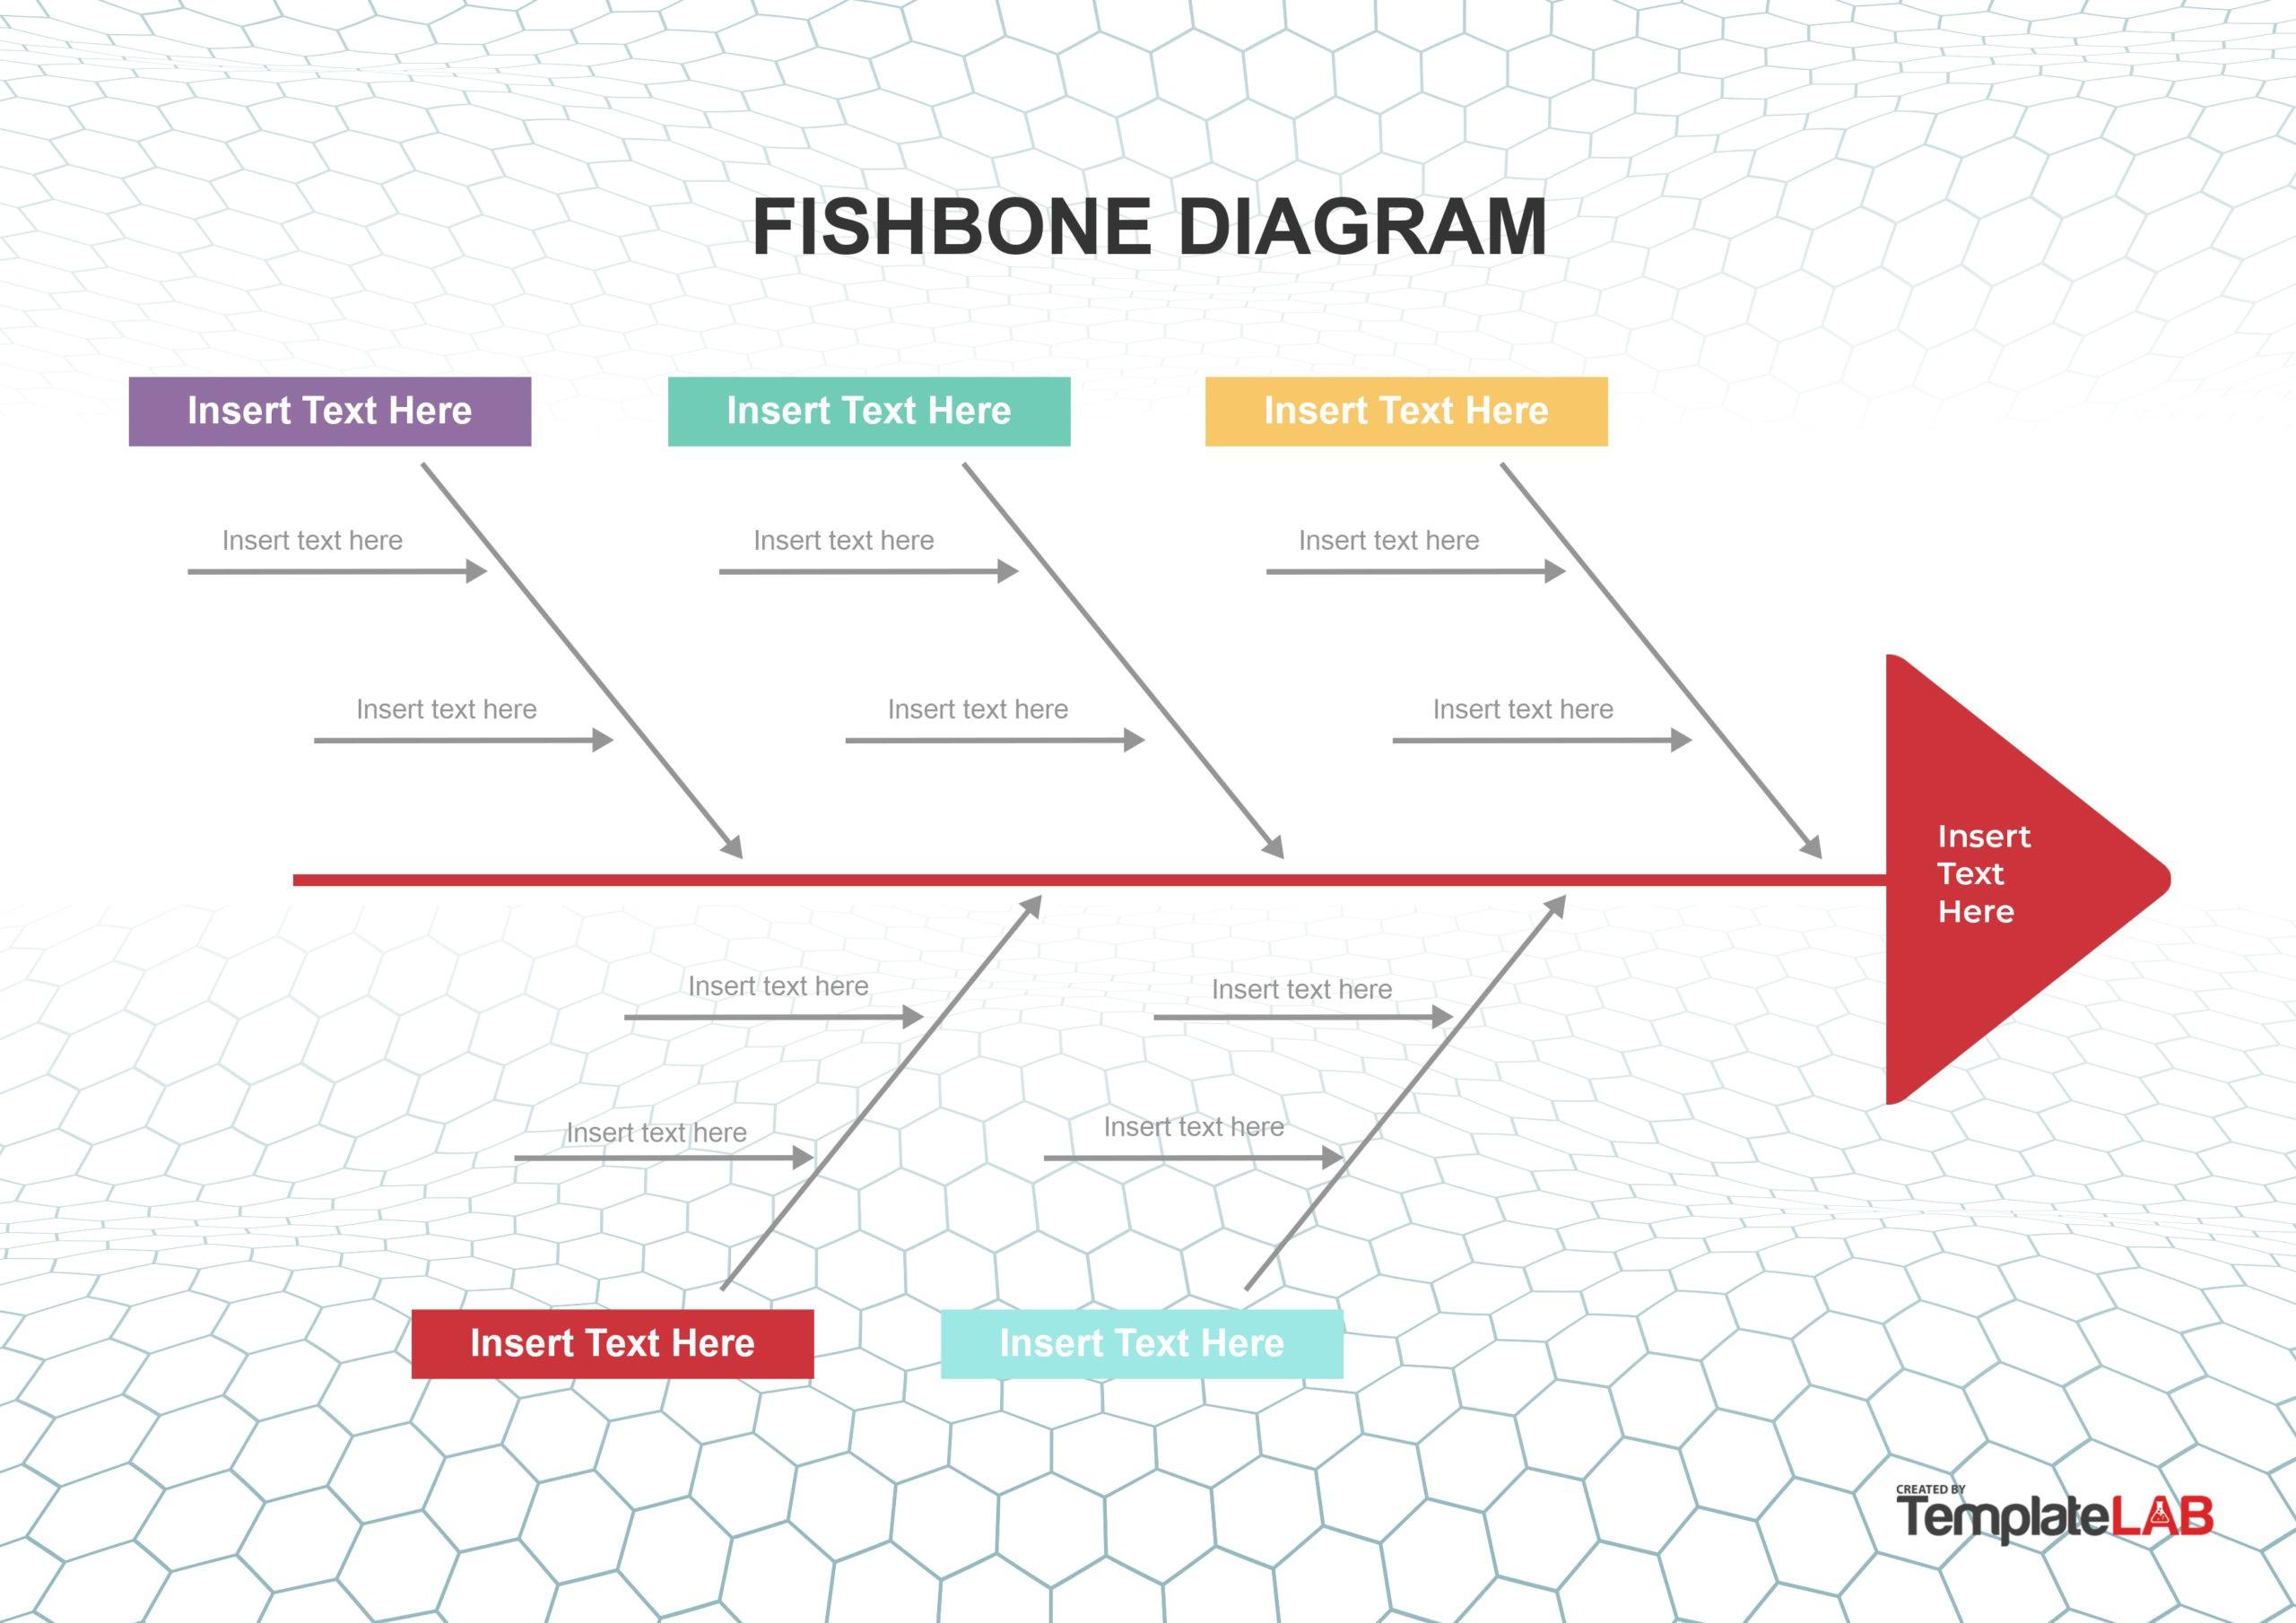 Free Fishbone Diagram Template 04 - TemplateLab.com